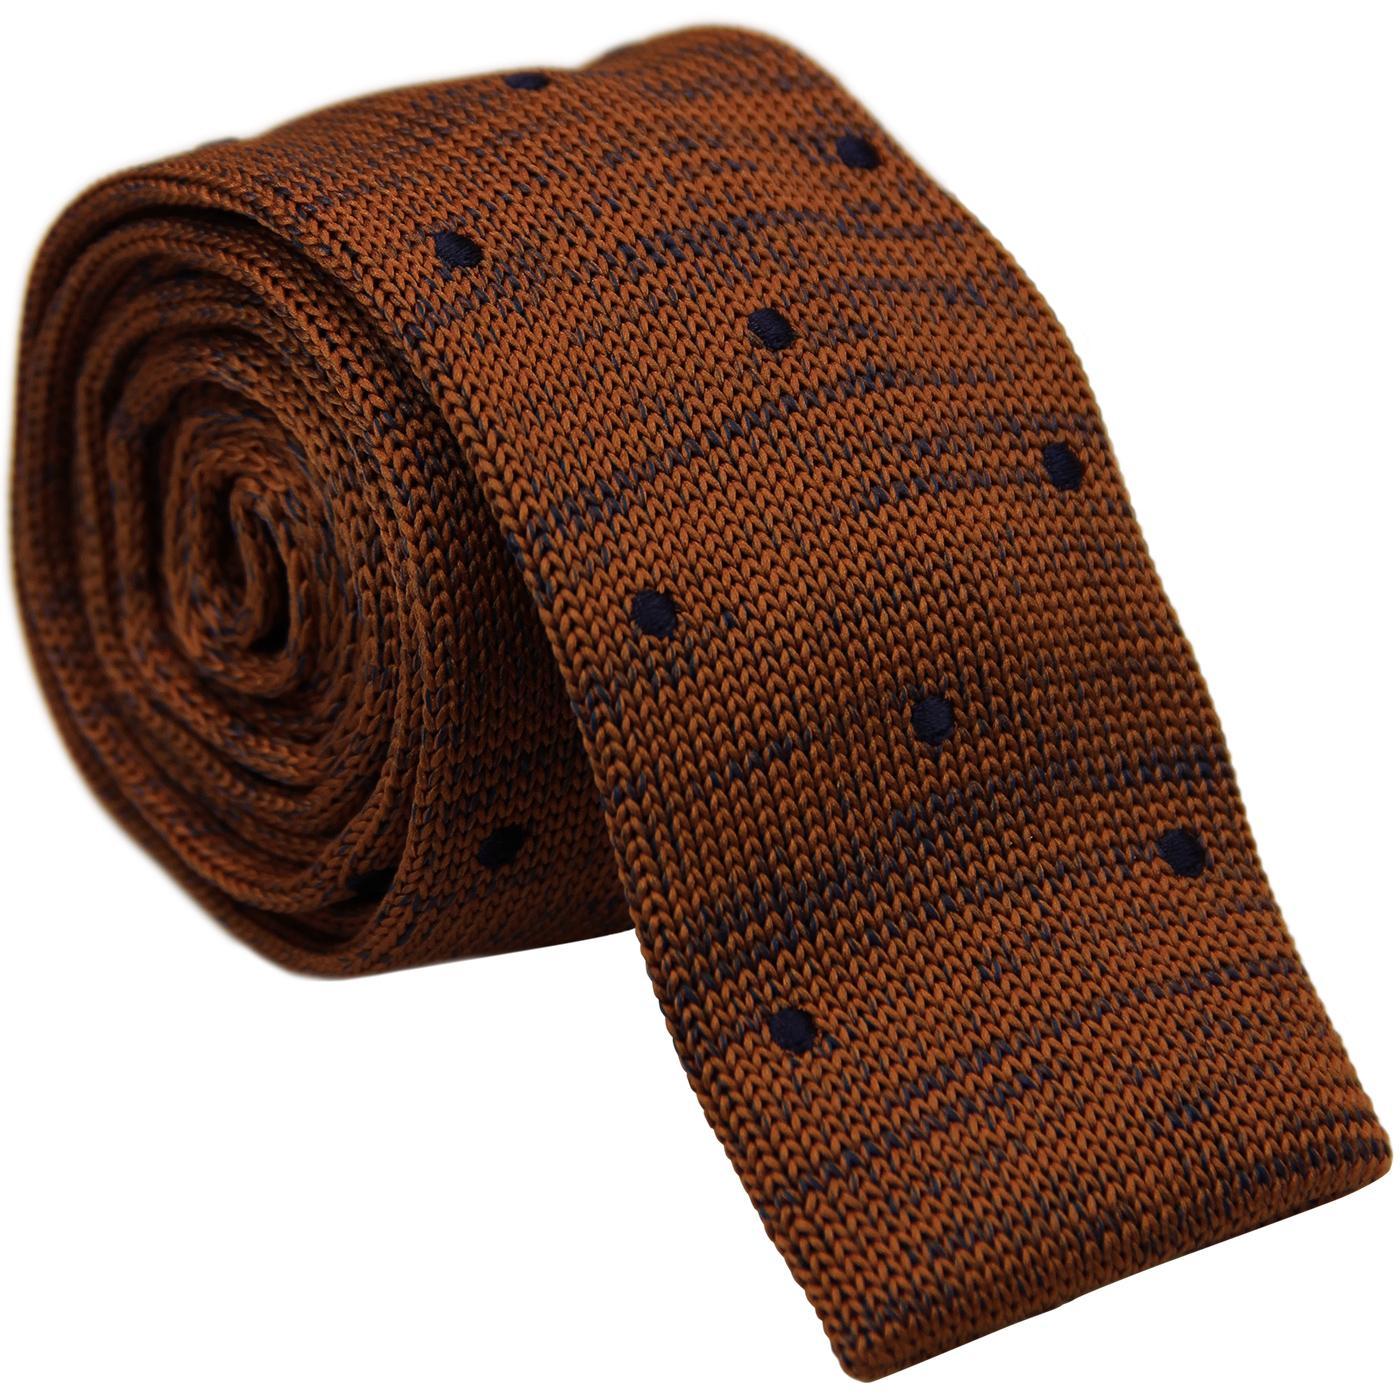 GIBSON LONDON 1960s Mod Spot Knitted Tie (Mustard)